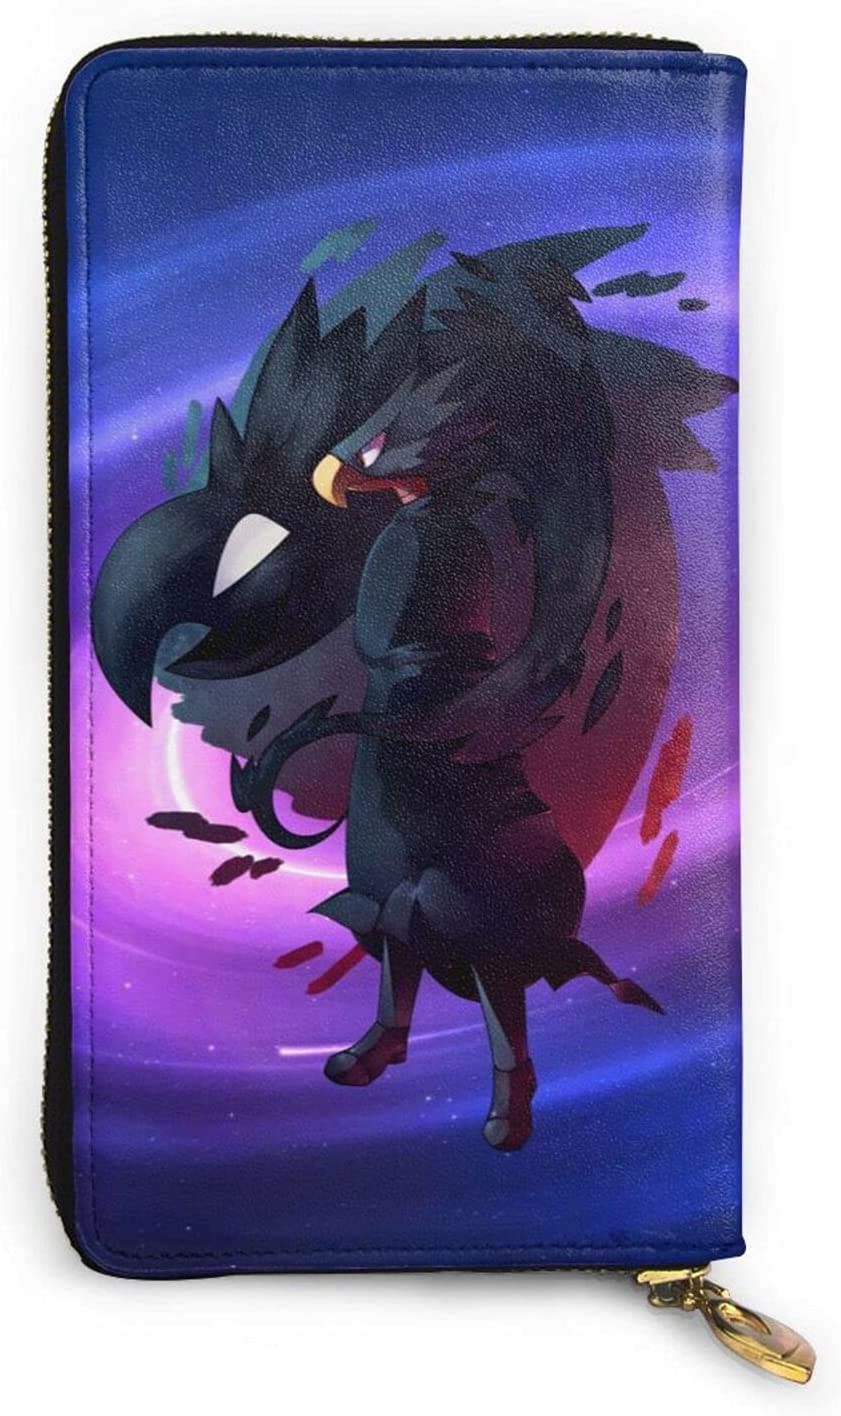 My Hero Academia Tokoyami New Shipping Free Fumikage Anime Wallet Leather Cartoon Fixed price for sale